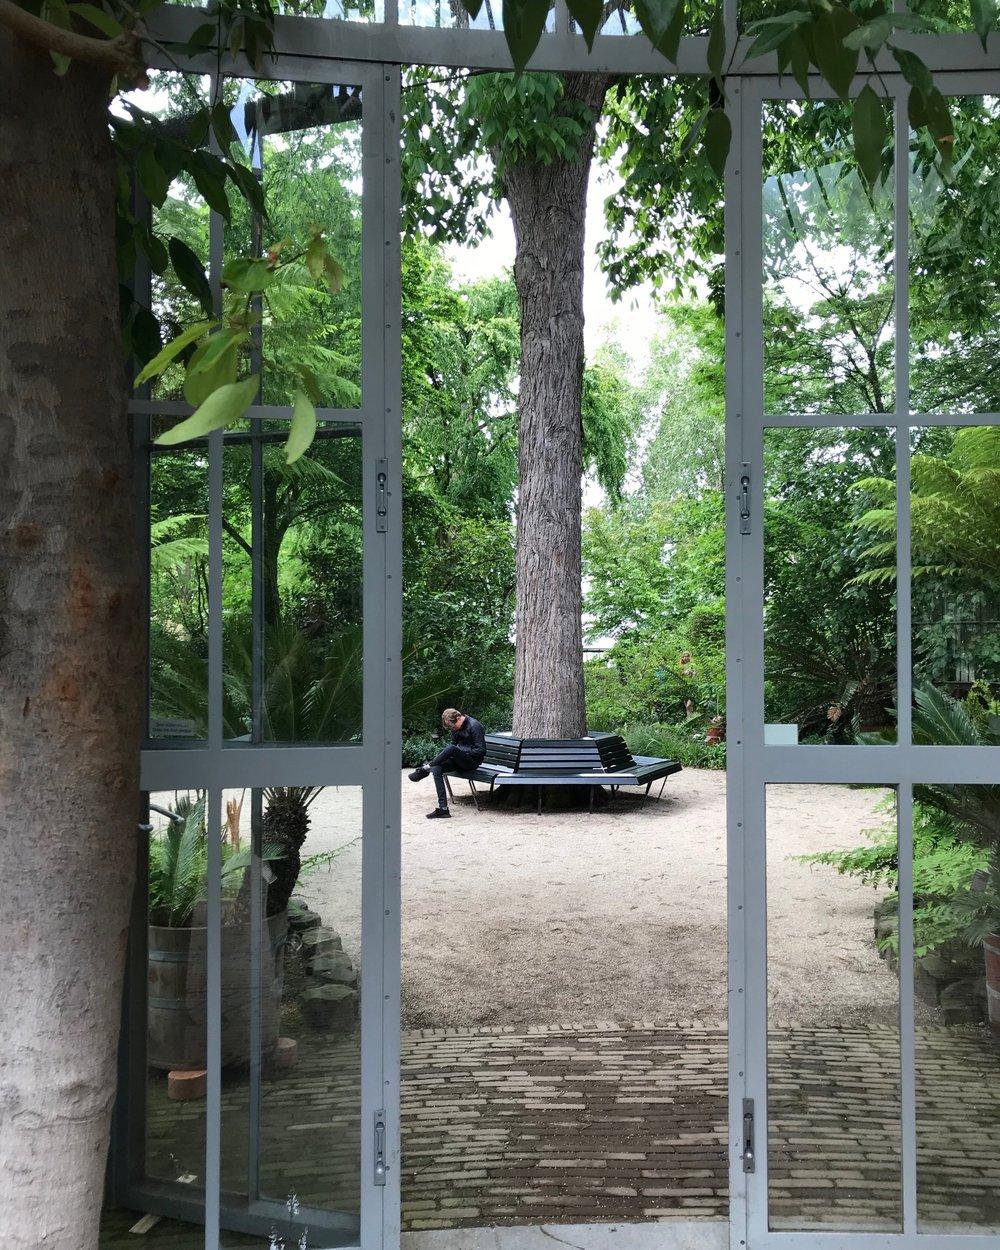 Hortus Amsterdam mr de Waal